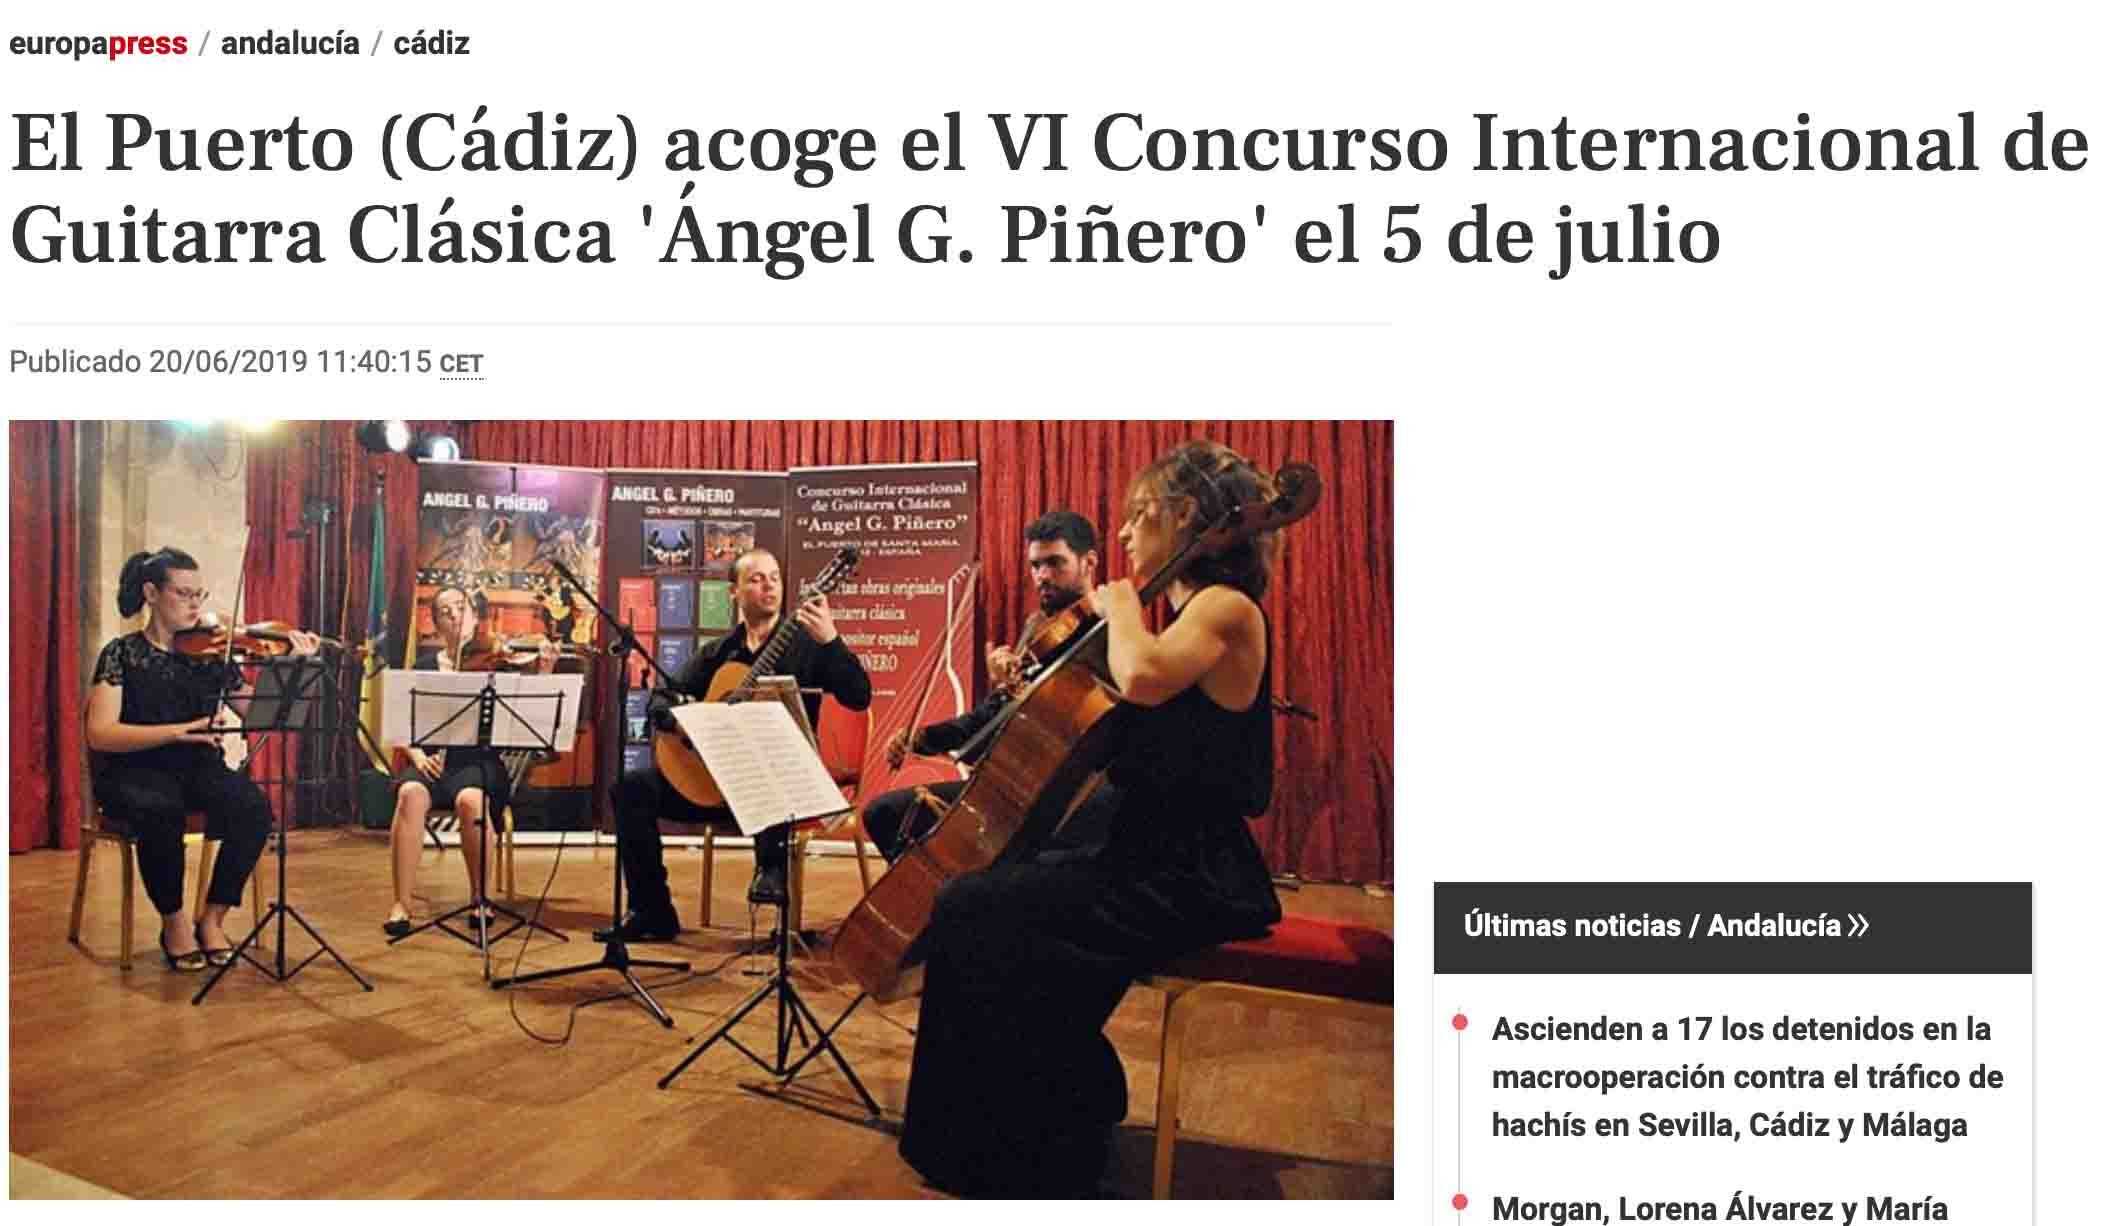 VI Concurso Internacional de Guitarra Clásica 'Ángel G. Piñero' en Europa Press